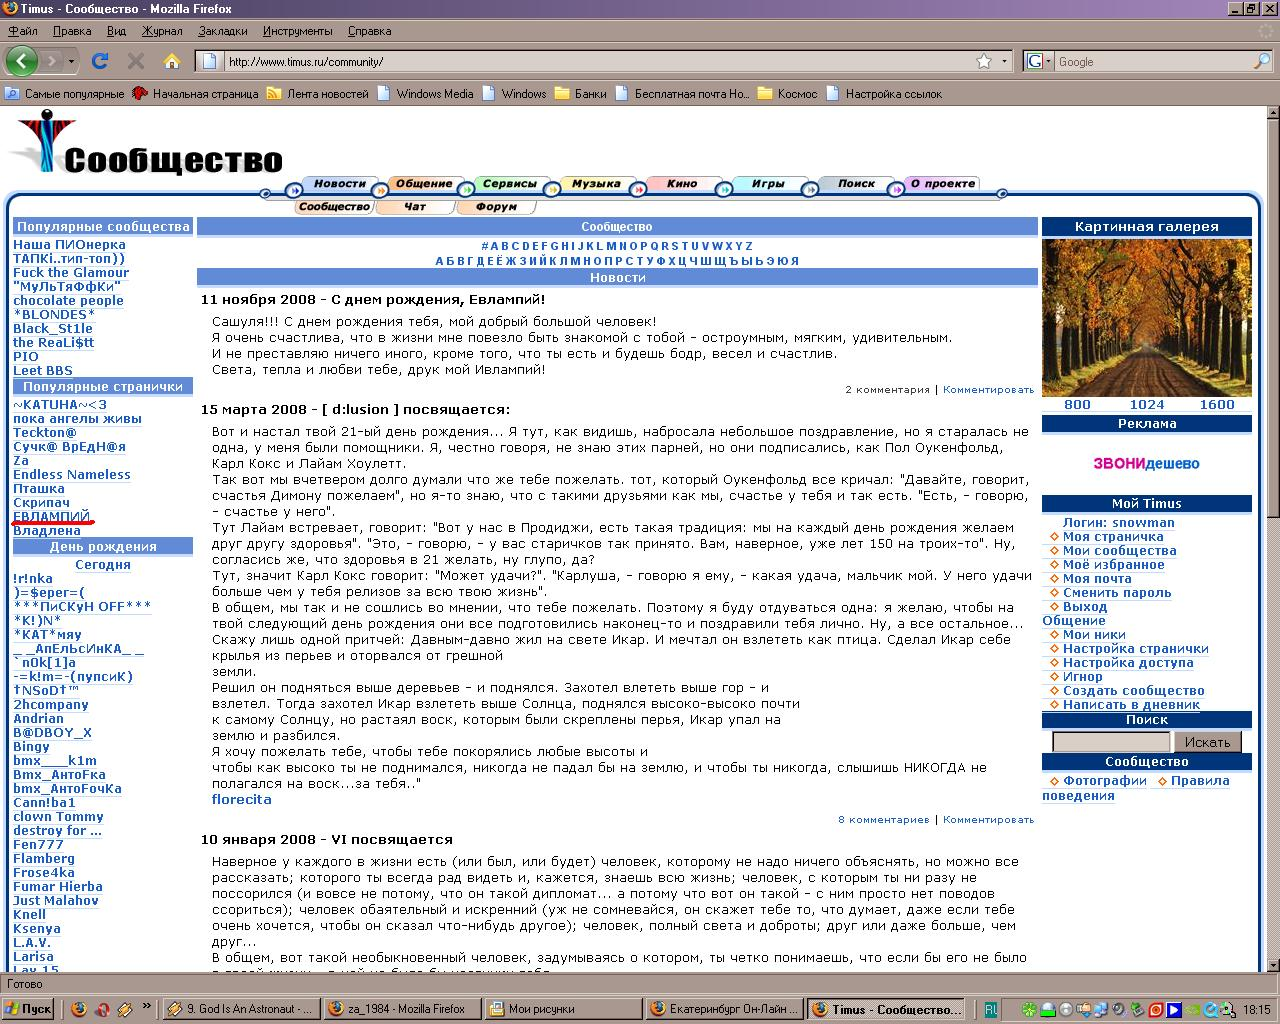 Нам Ои индонезийская веб леди